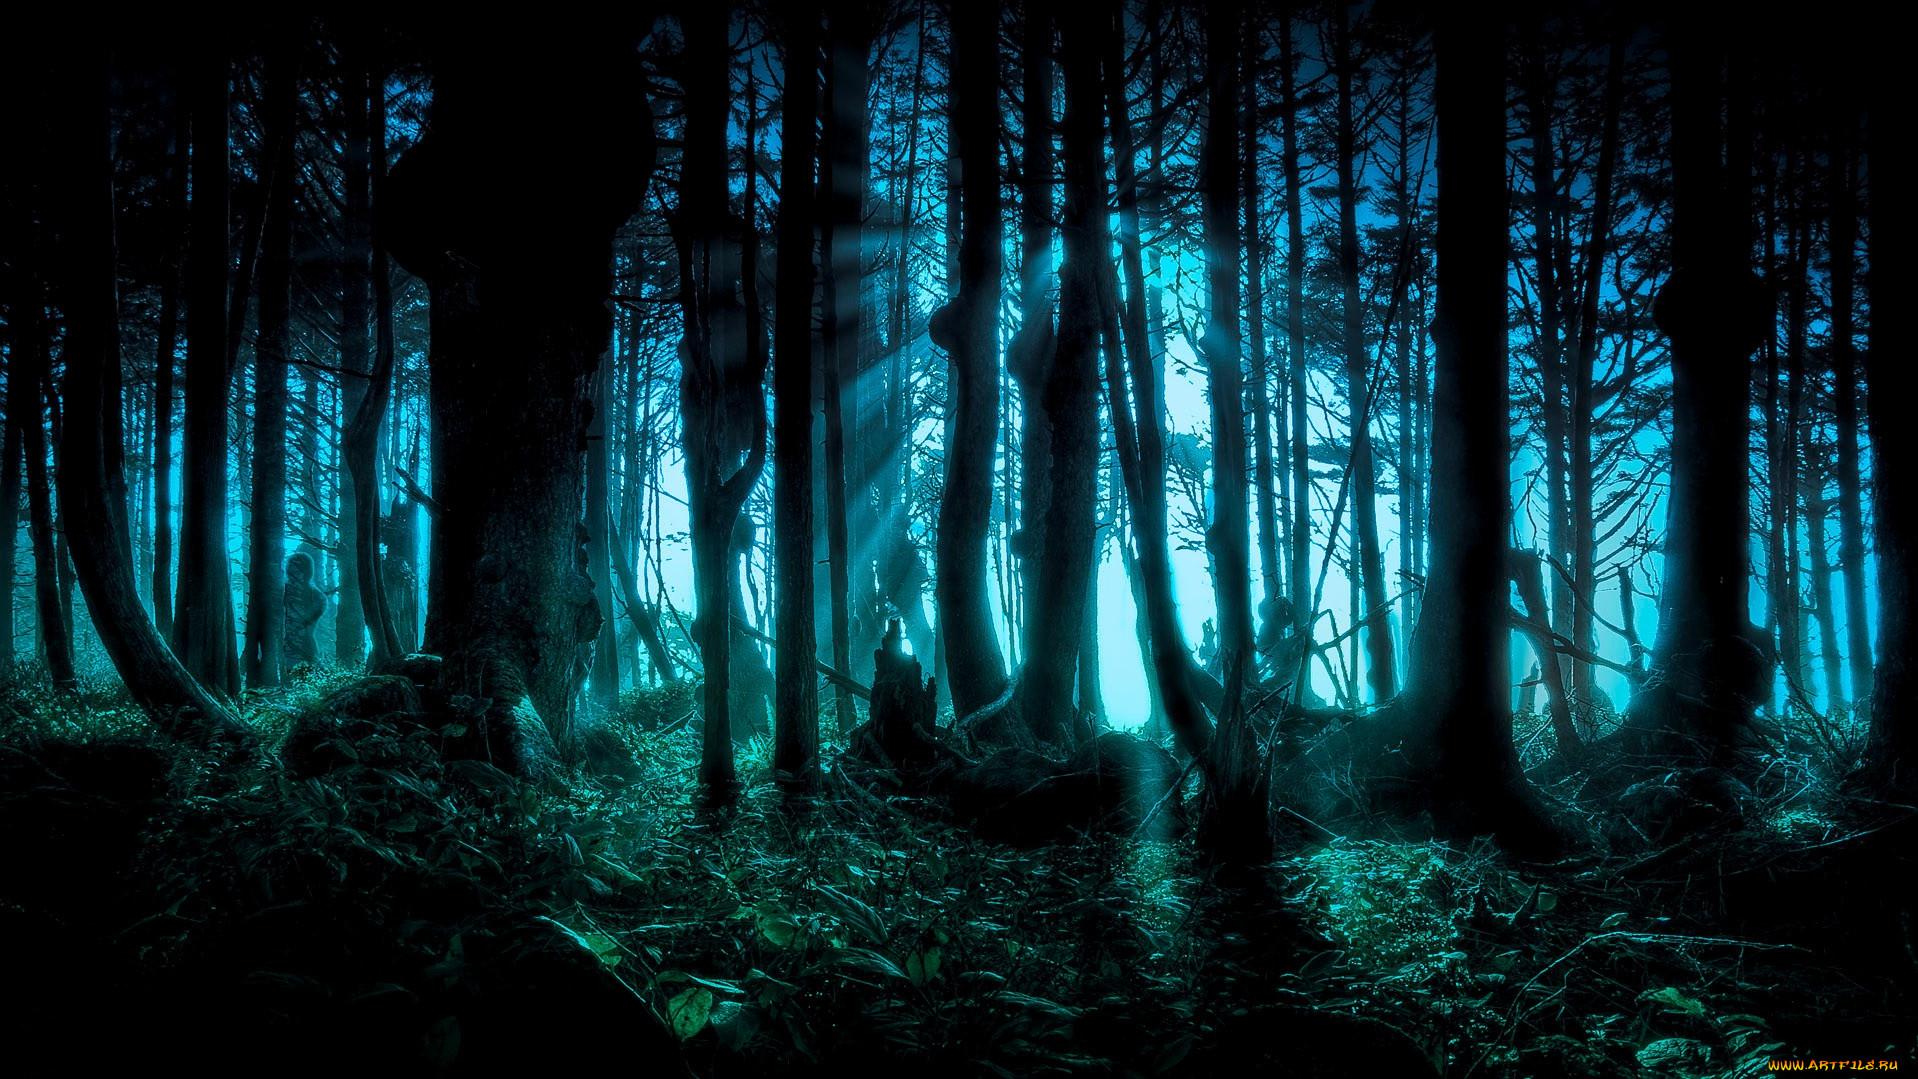 an analysis of thoreaus theory that human life mimicks nature